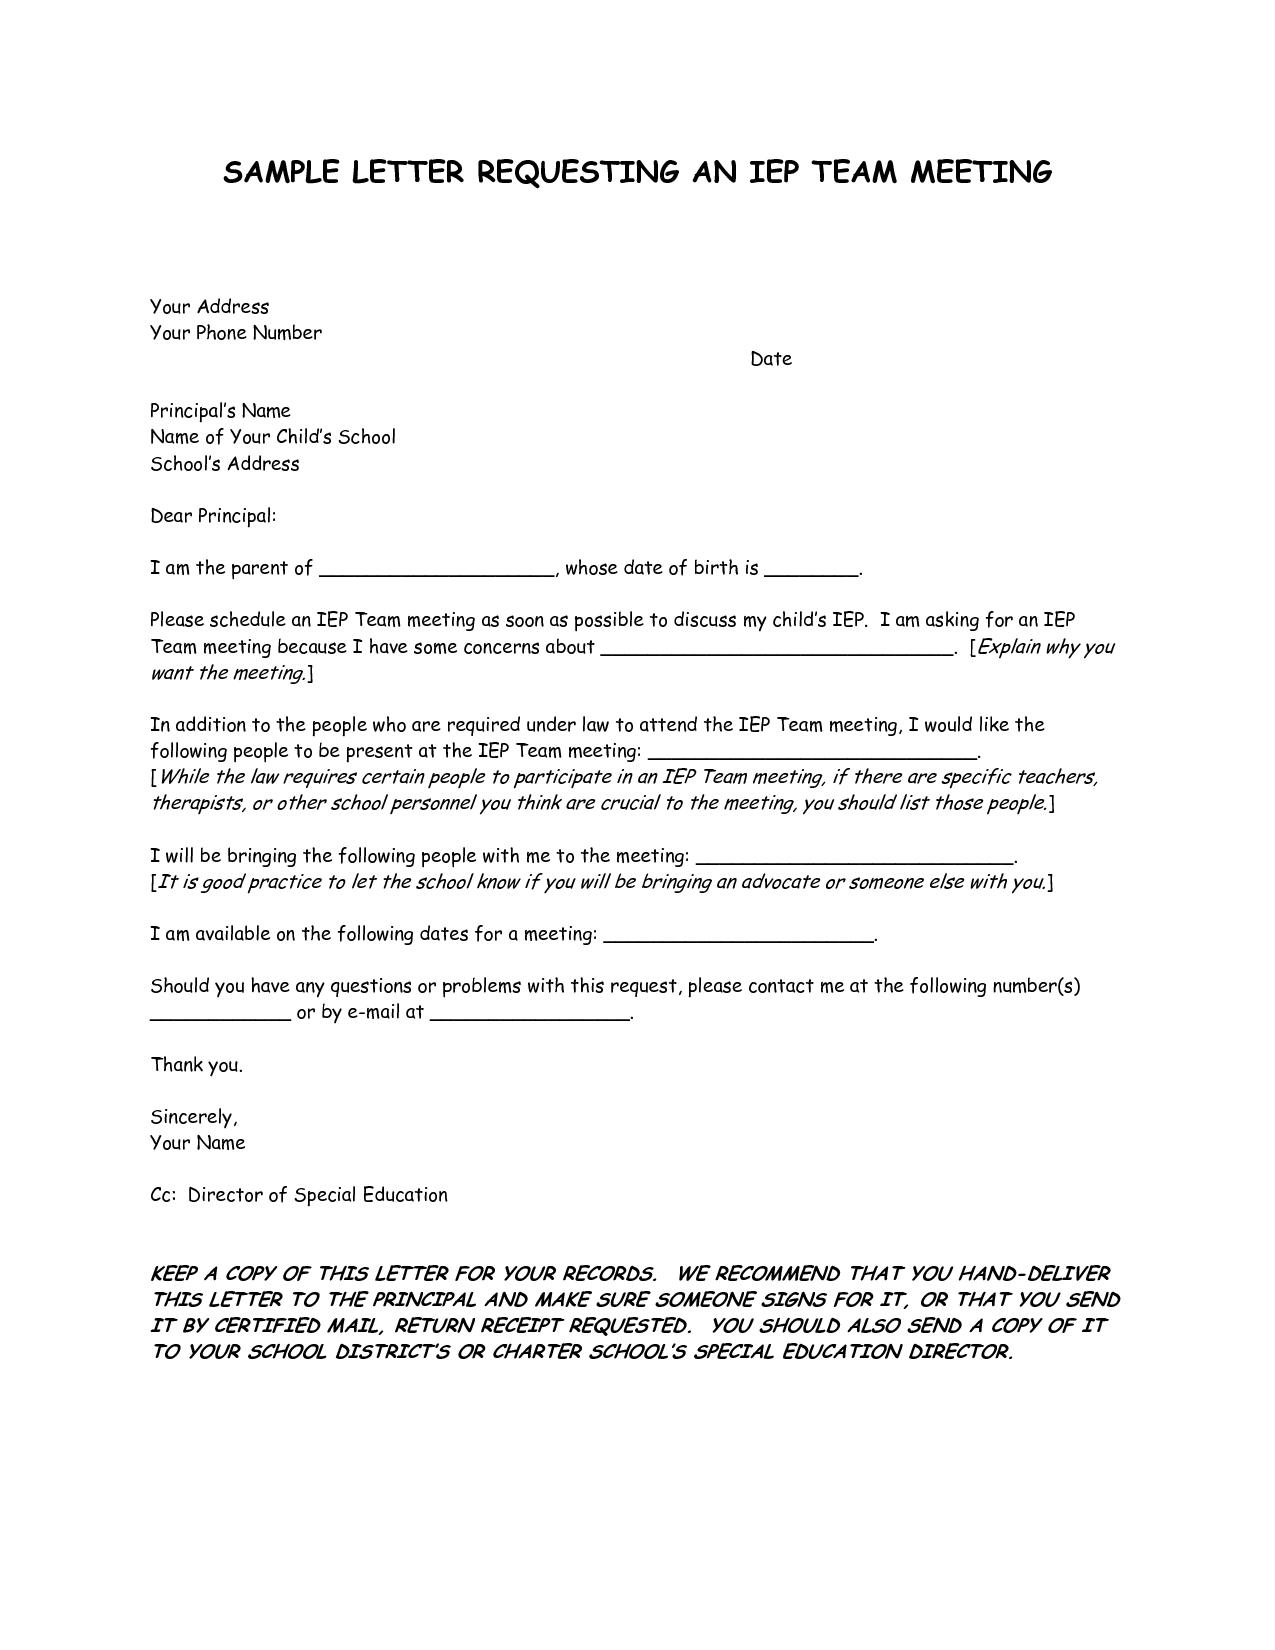 Parent Meeting Letters